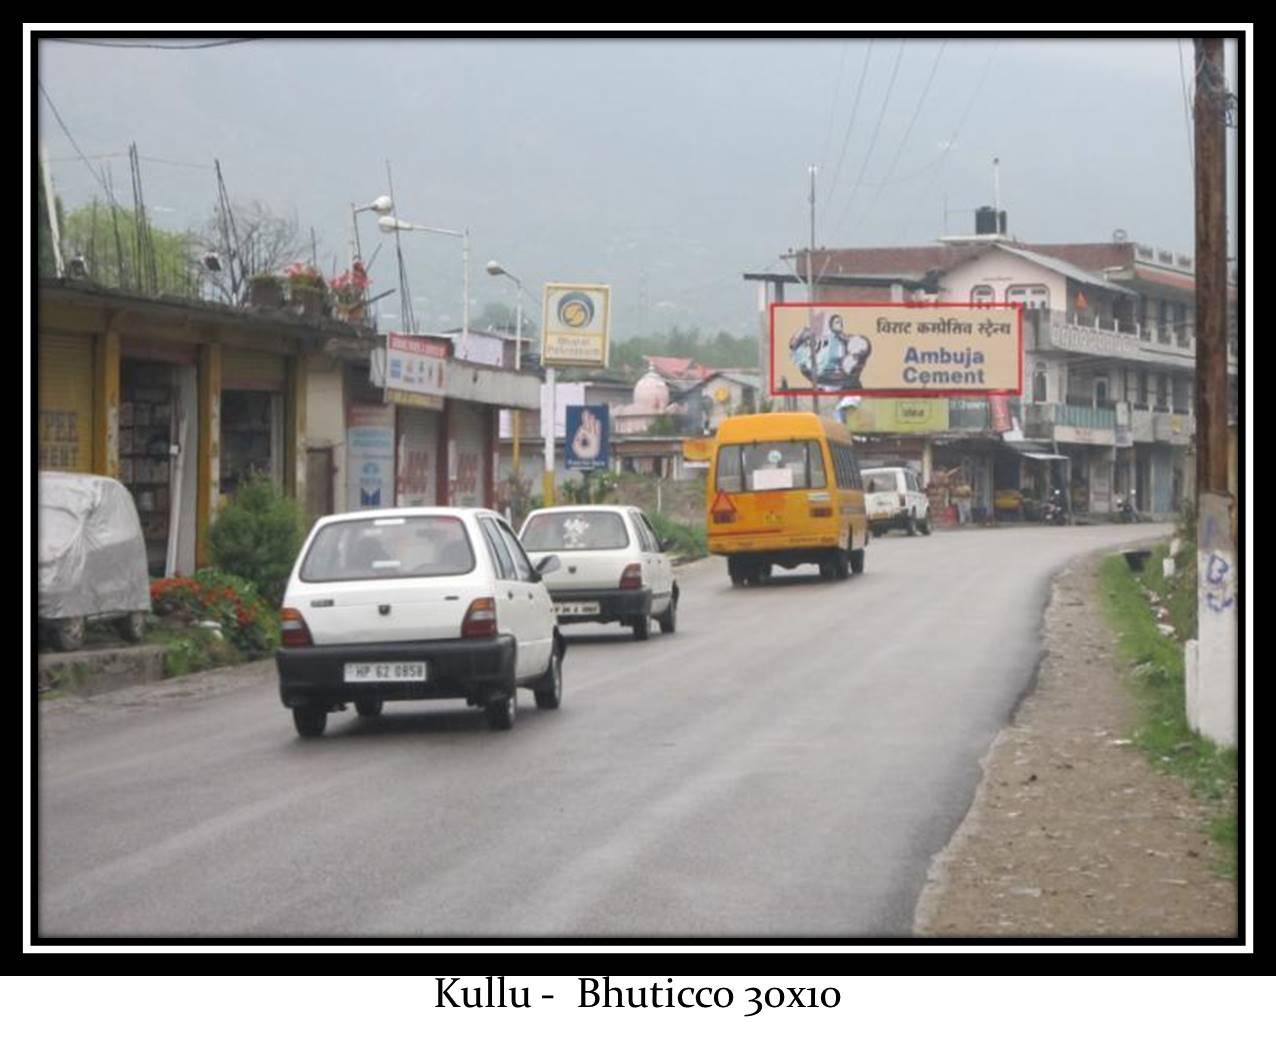 Bhuticco, Kullu